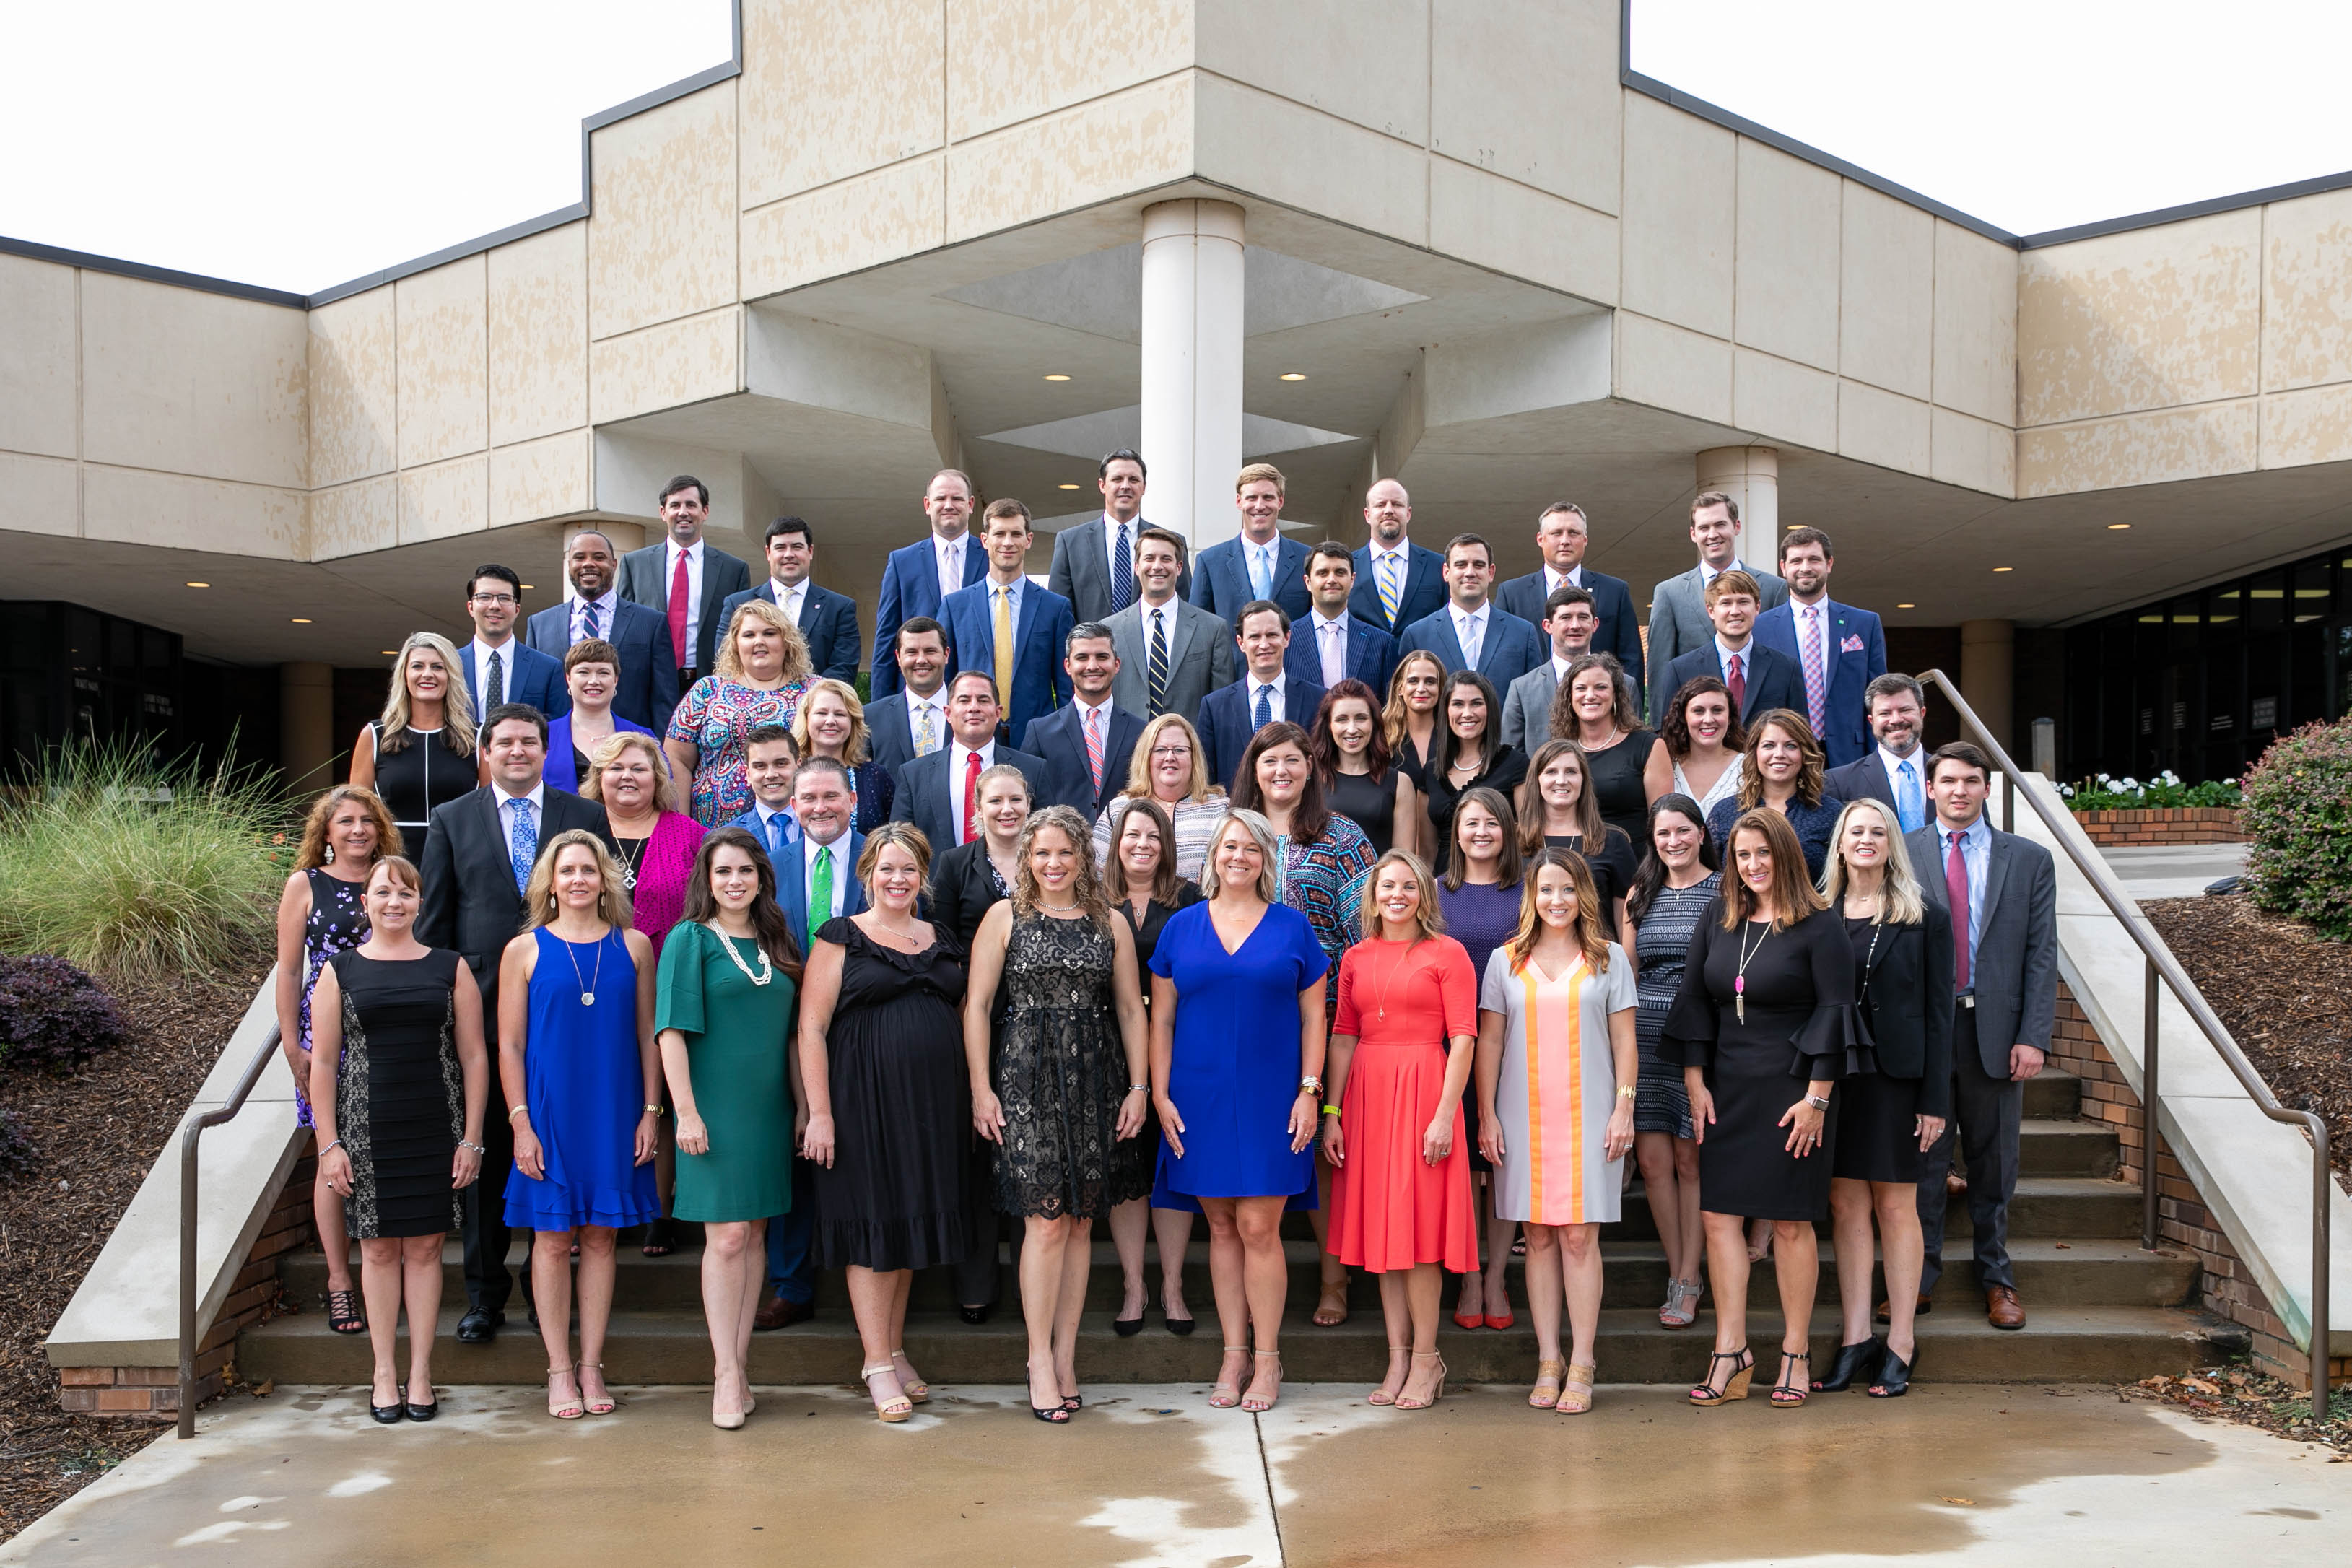 South Carolina Bankers School Graduating Class of 2019